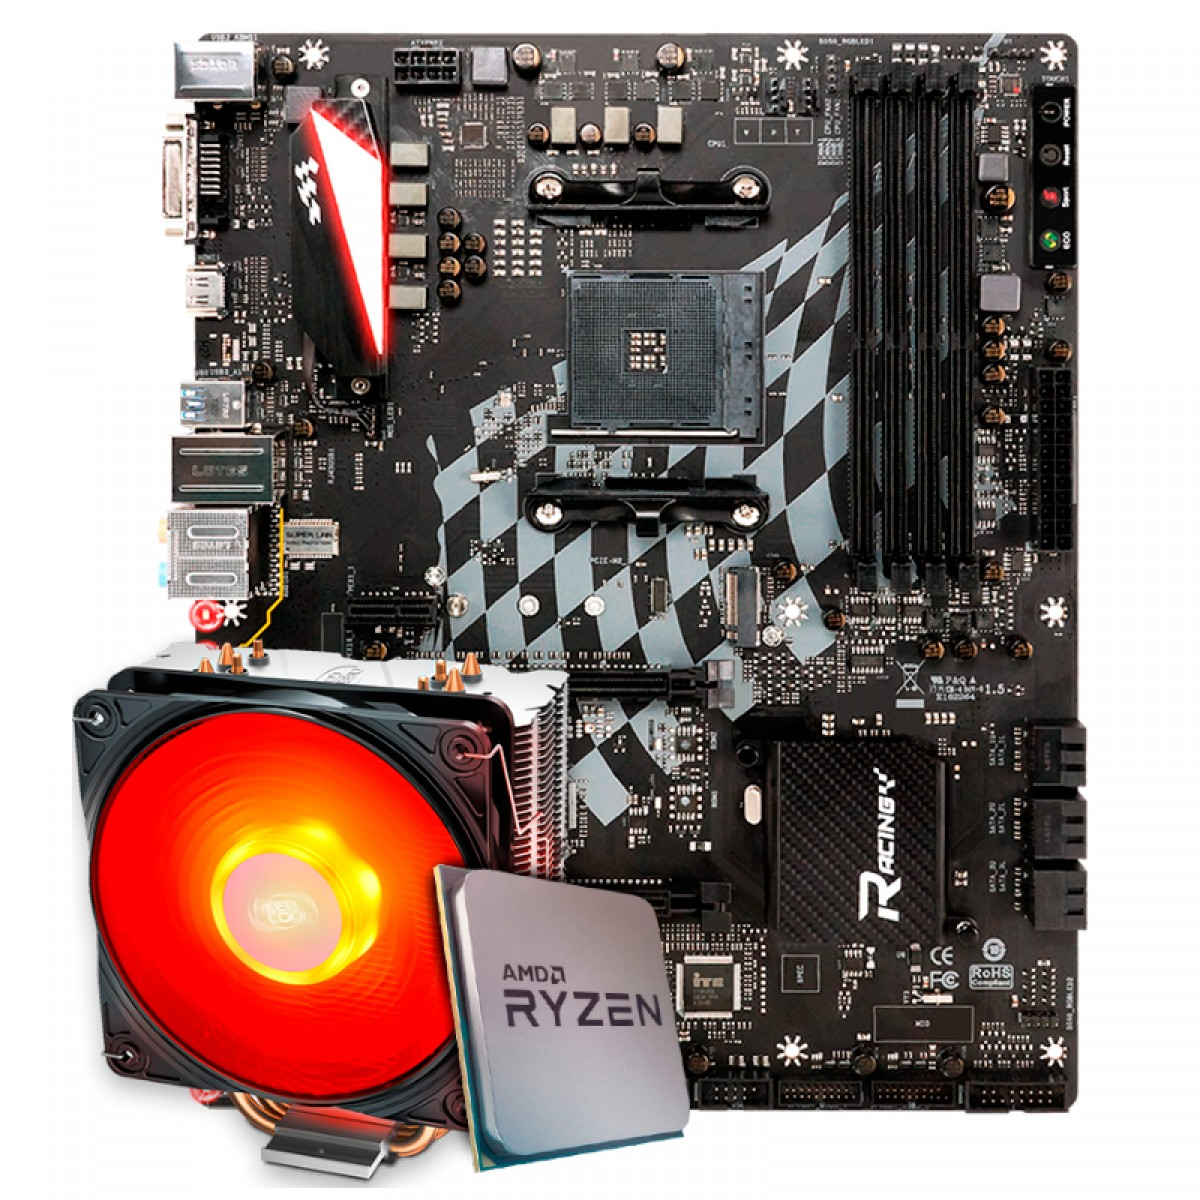 Kit Upgrade, AMD Ryzen 9 3900X, Biostar Racing X470GTA, Cooler Deepcool Gammaxx 400